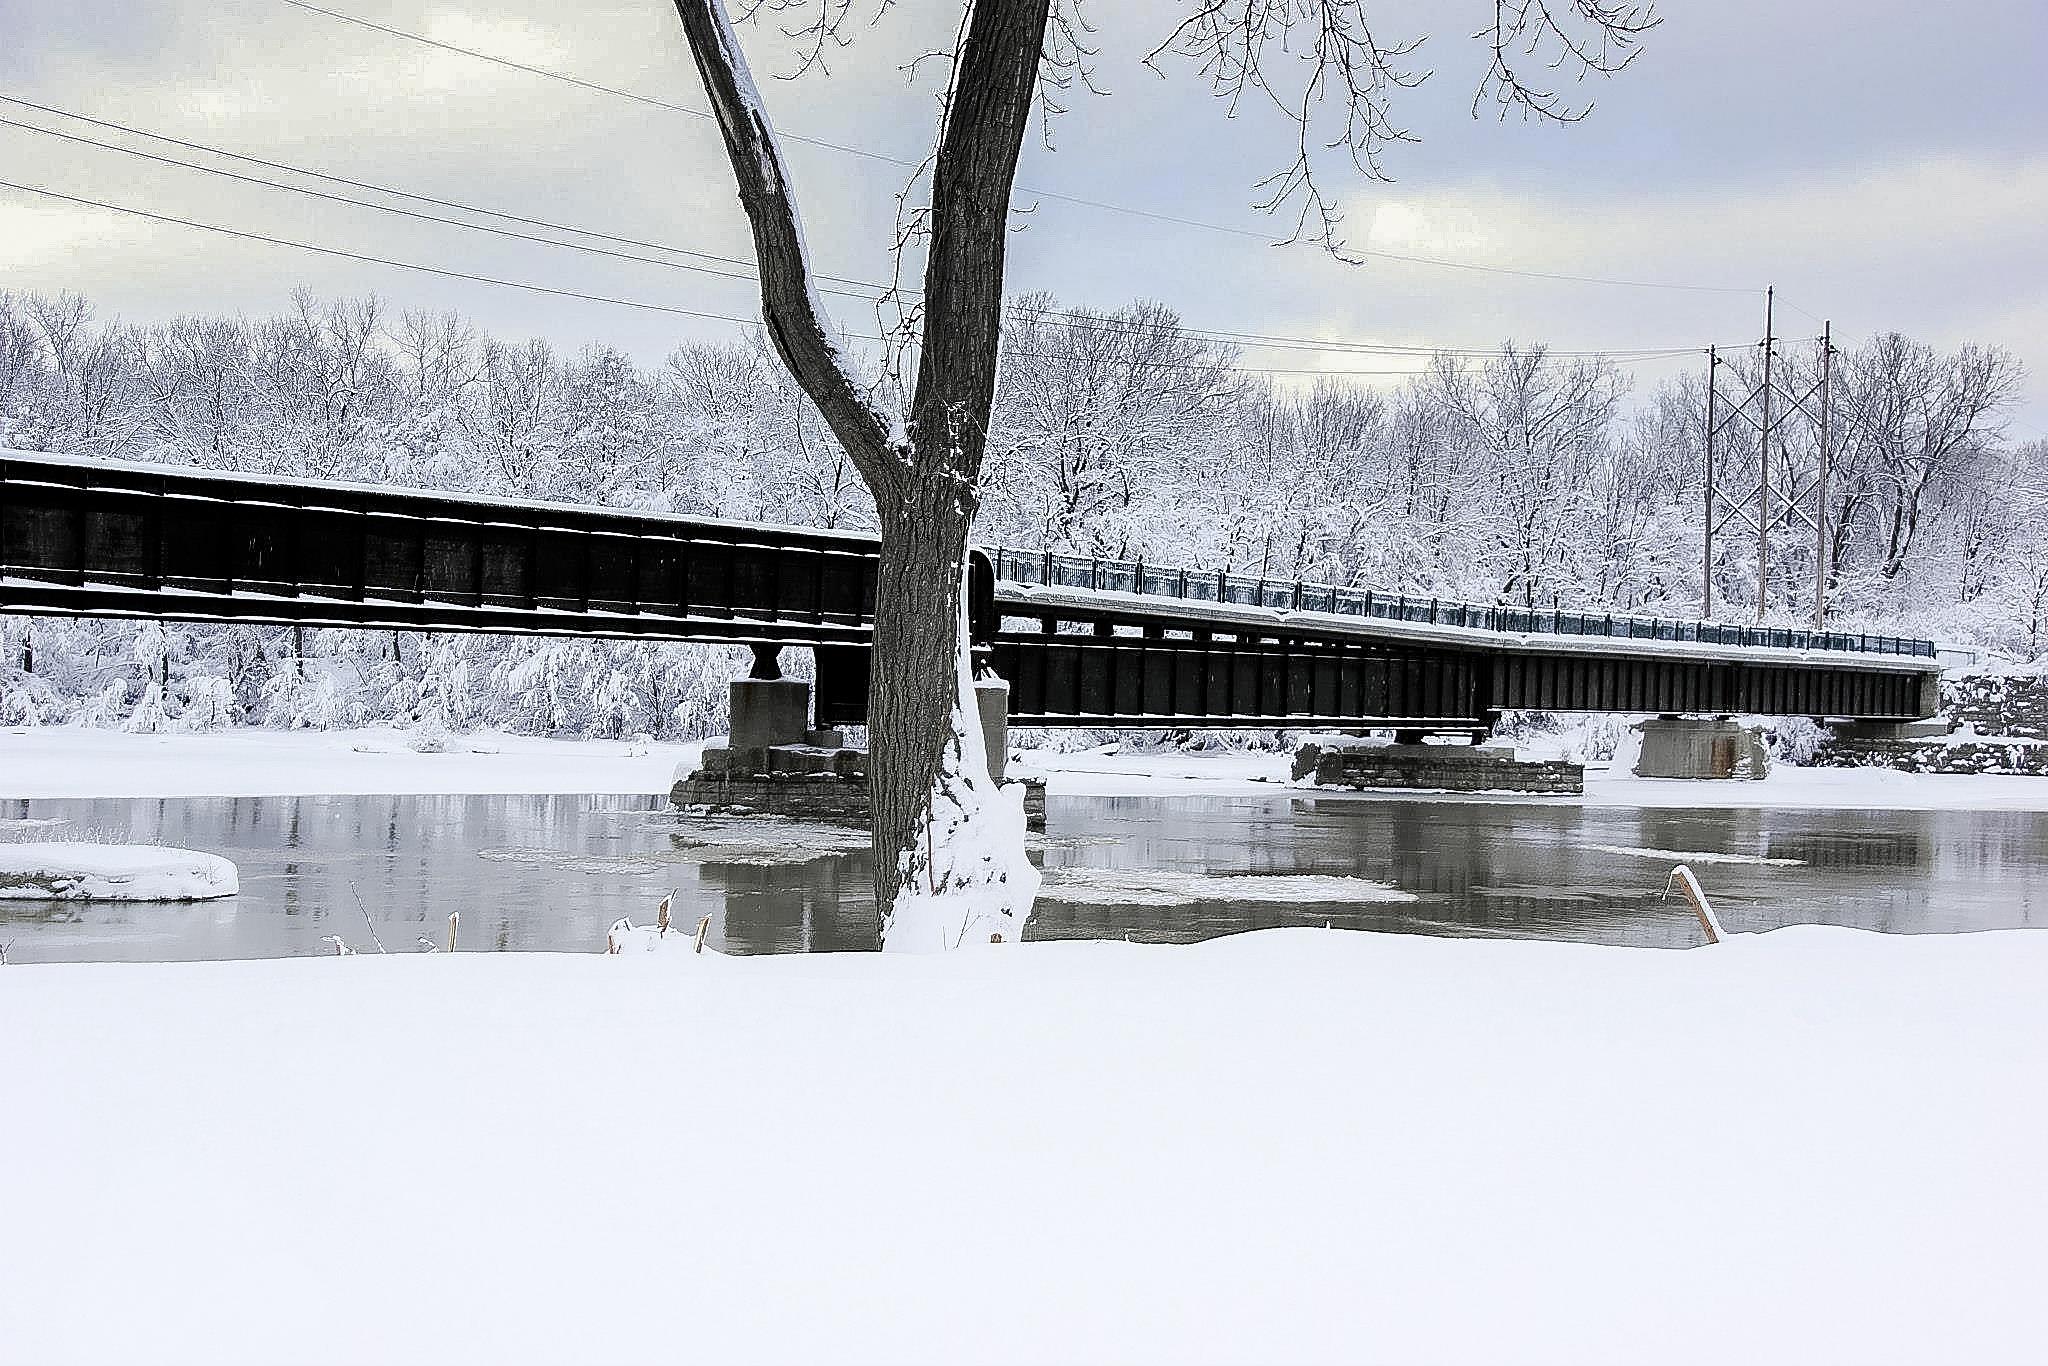 #wintercontest by BarryBihrlePhotography